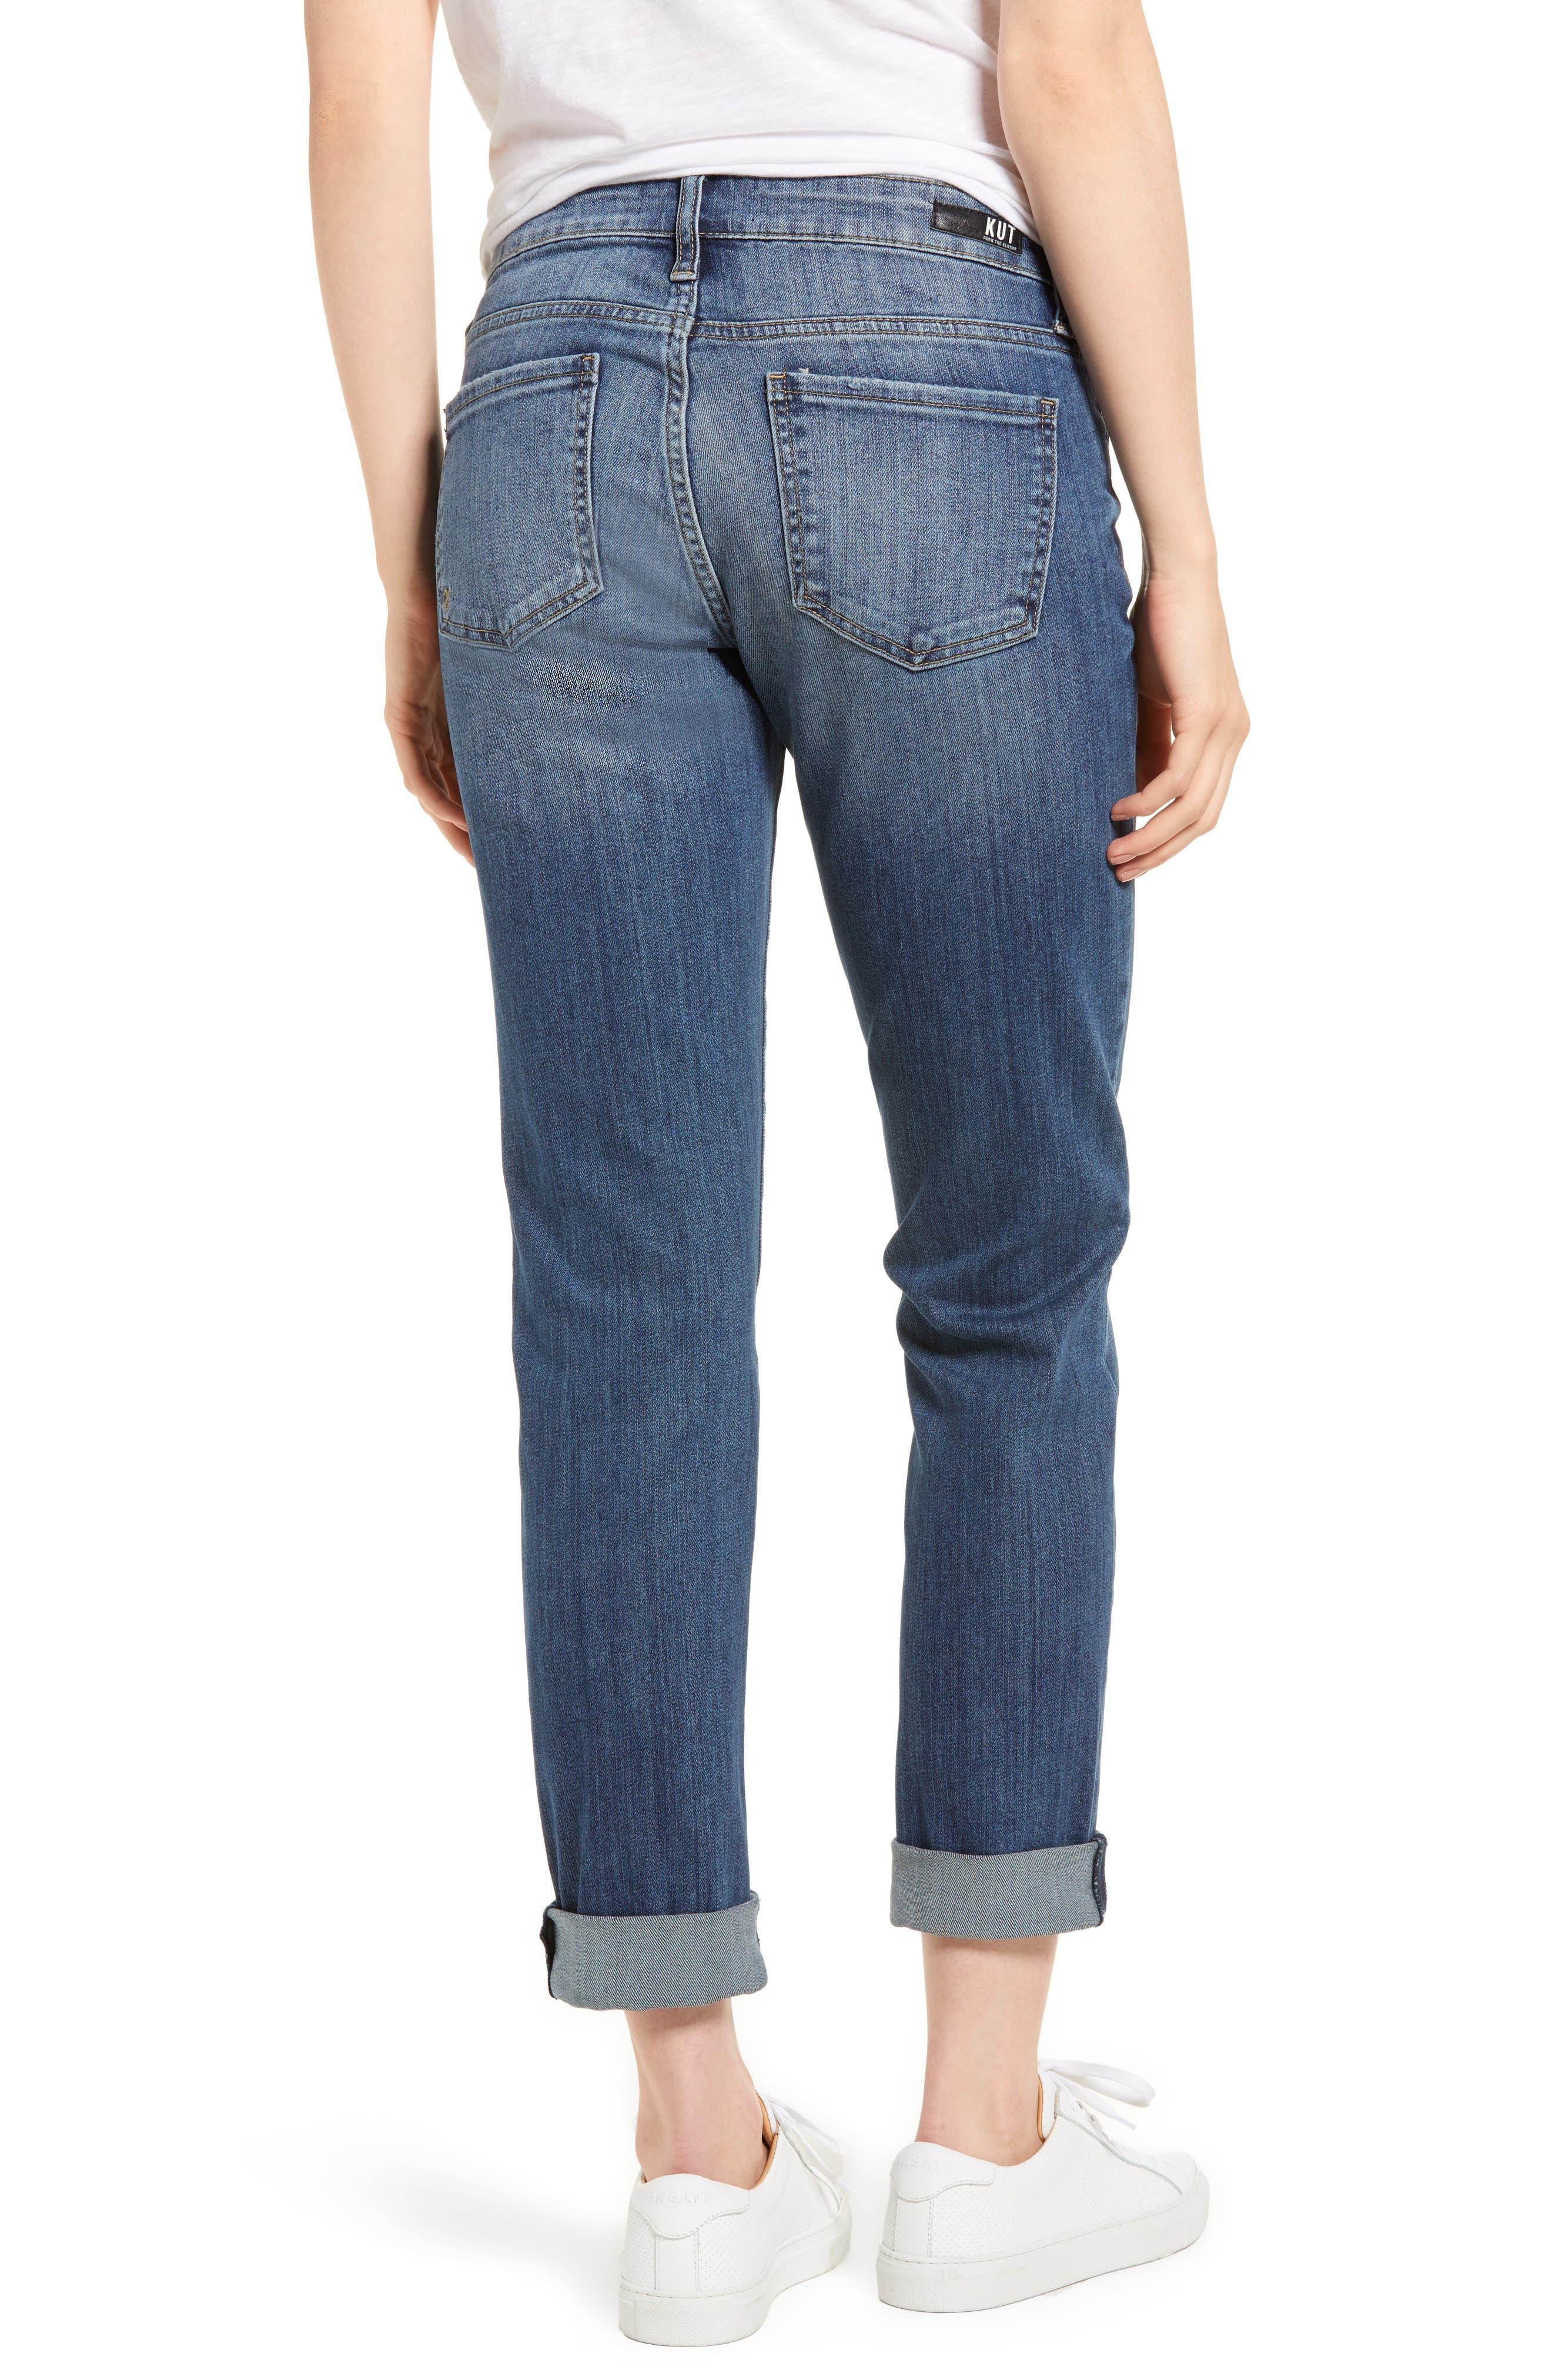 Catherine Boyfriend Jeans,                             Alternate thumbnail 2, color,                             Improvise